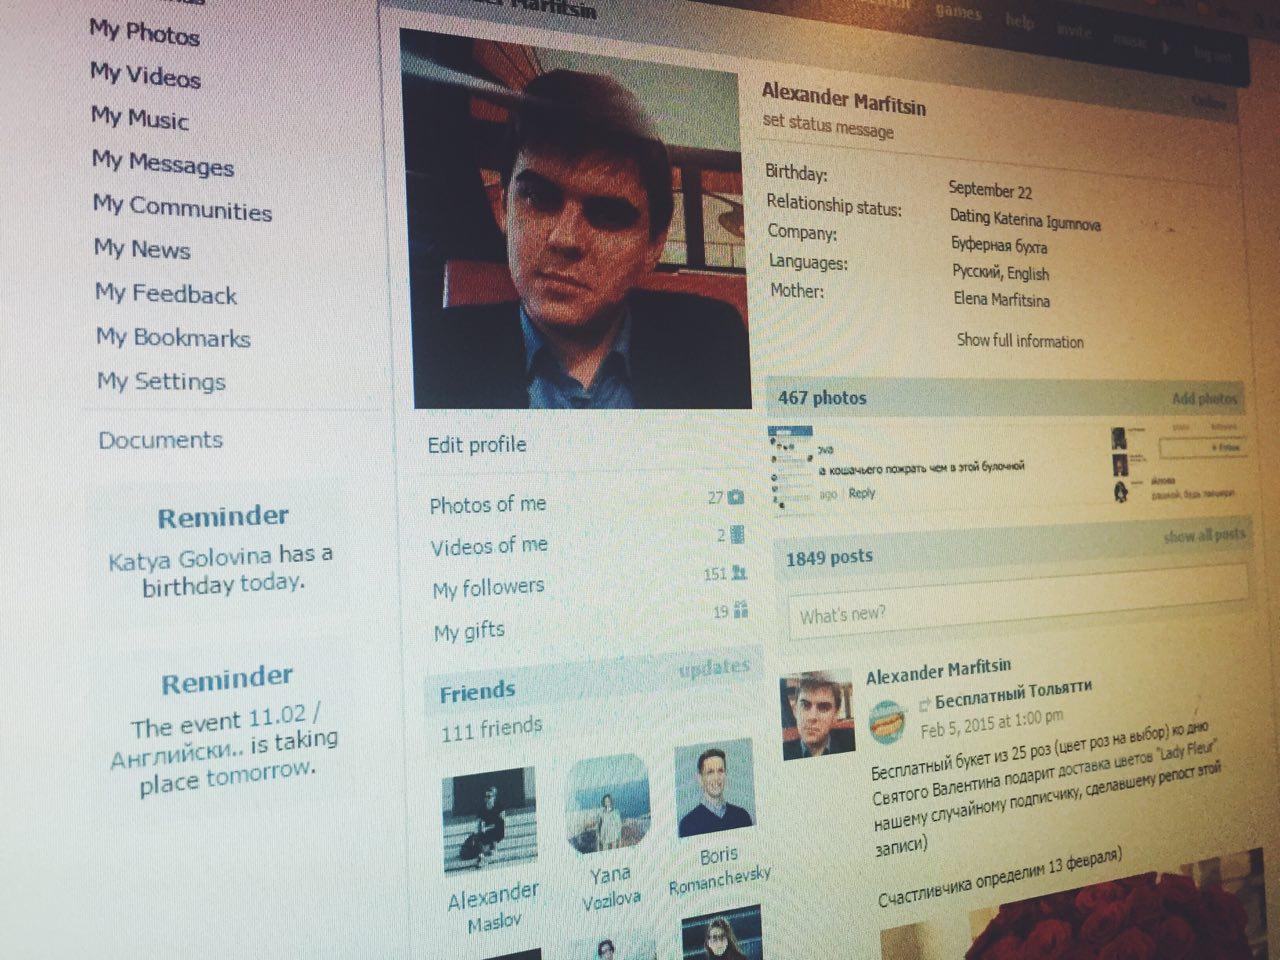 Приложение ВКонтакте теперь поддерживает iPhone 6 и iPhone 6 Plus